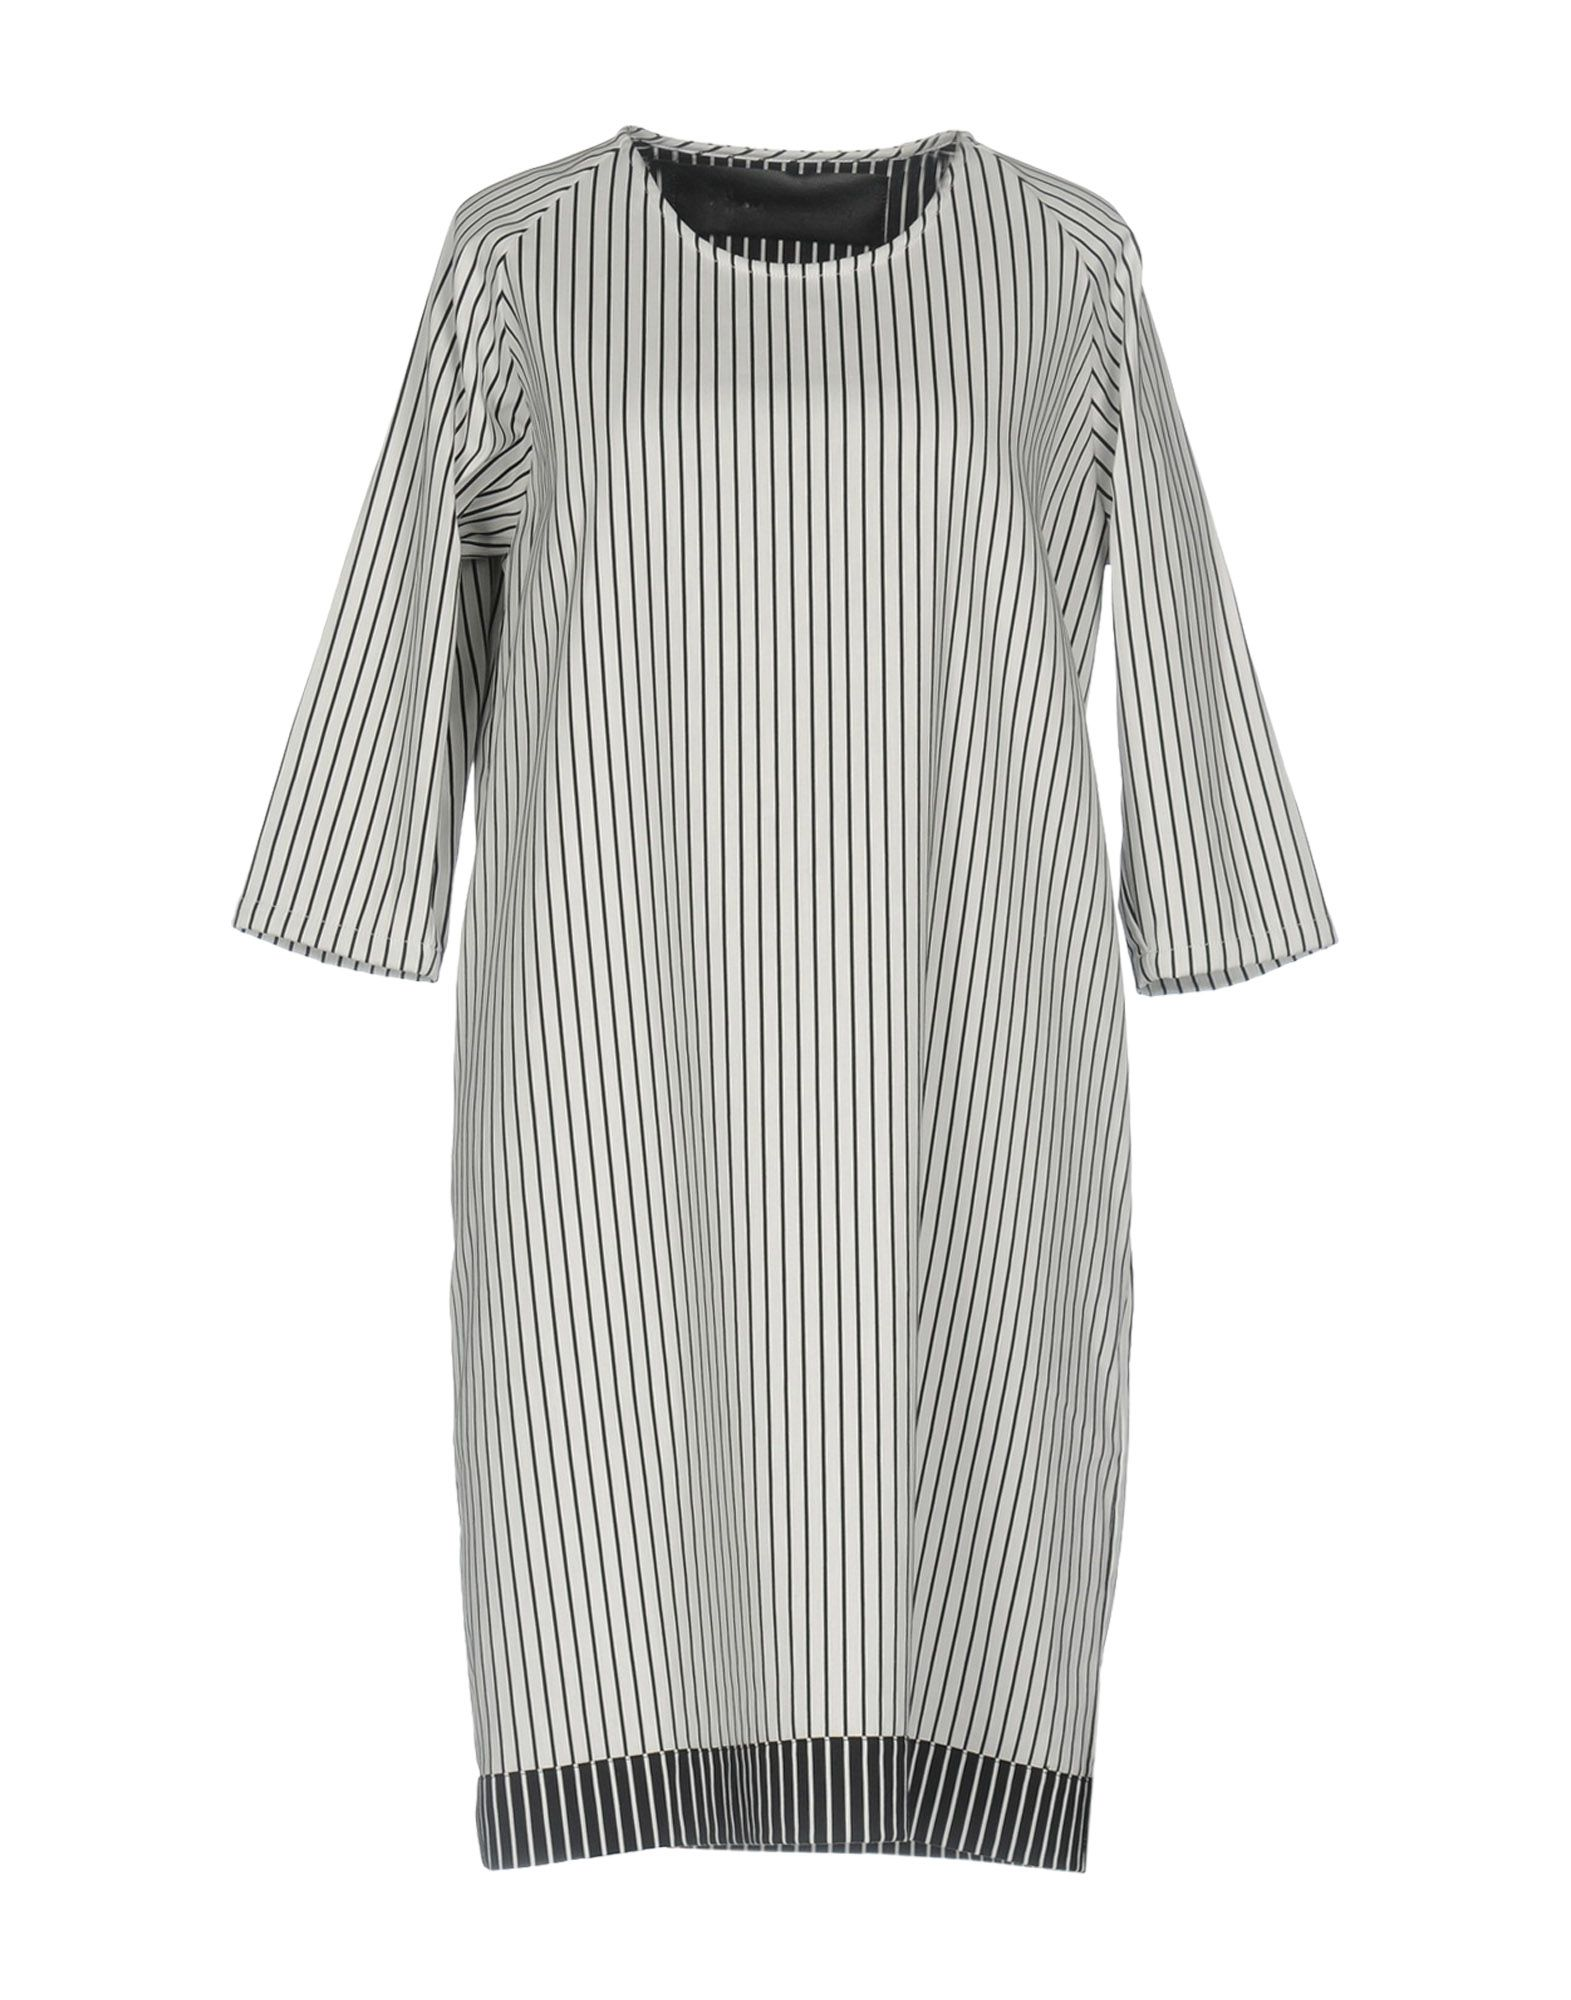 D' ALPAOS Короткое платье платье d